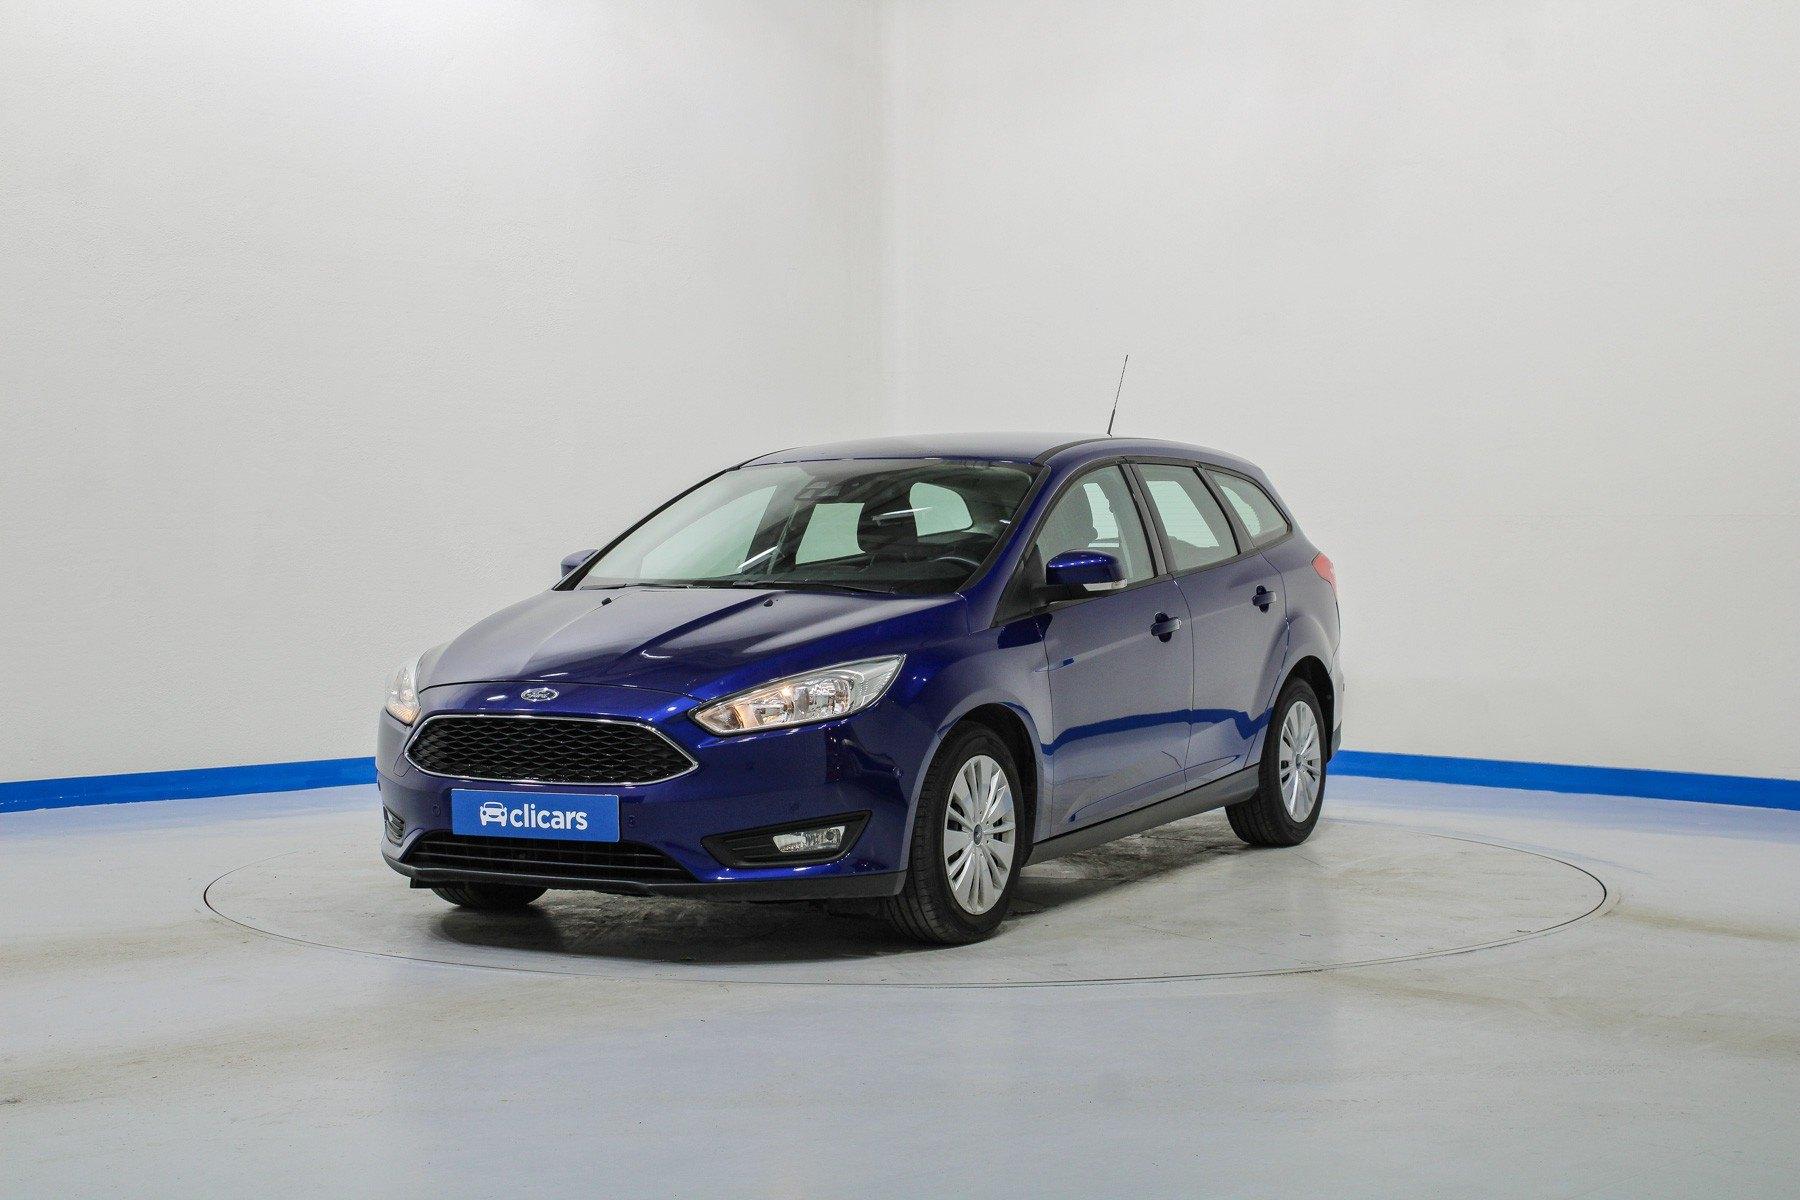 Ford Focus Diésel 1.5 TDCi E6 70kW (95CV) Trend Sportbreak 1